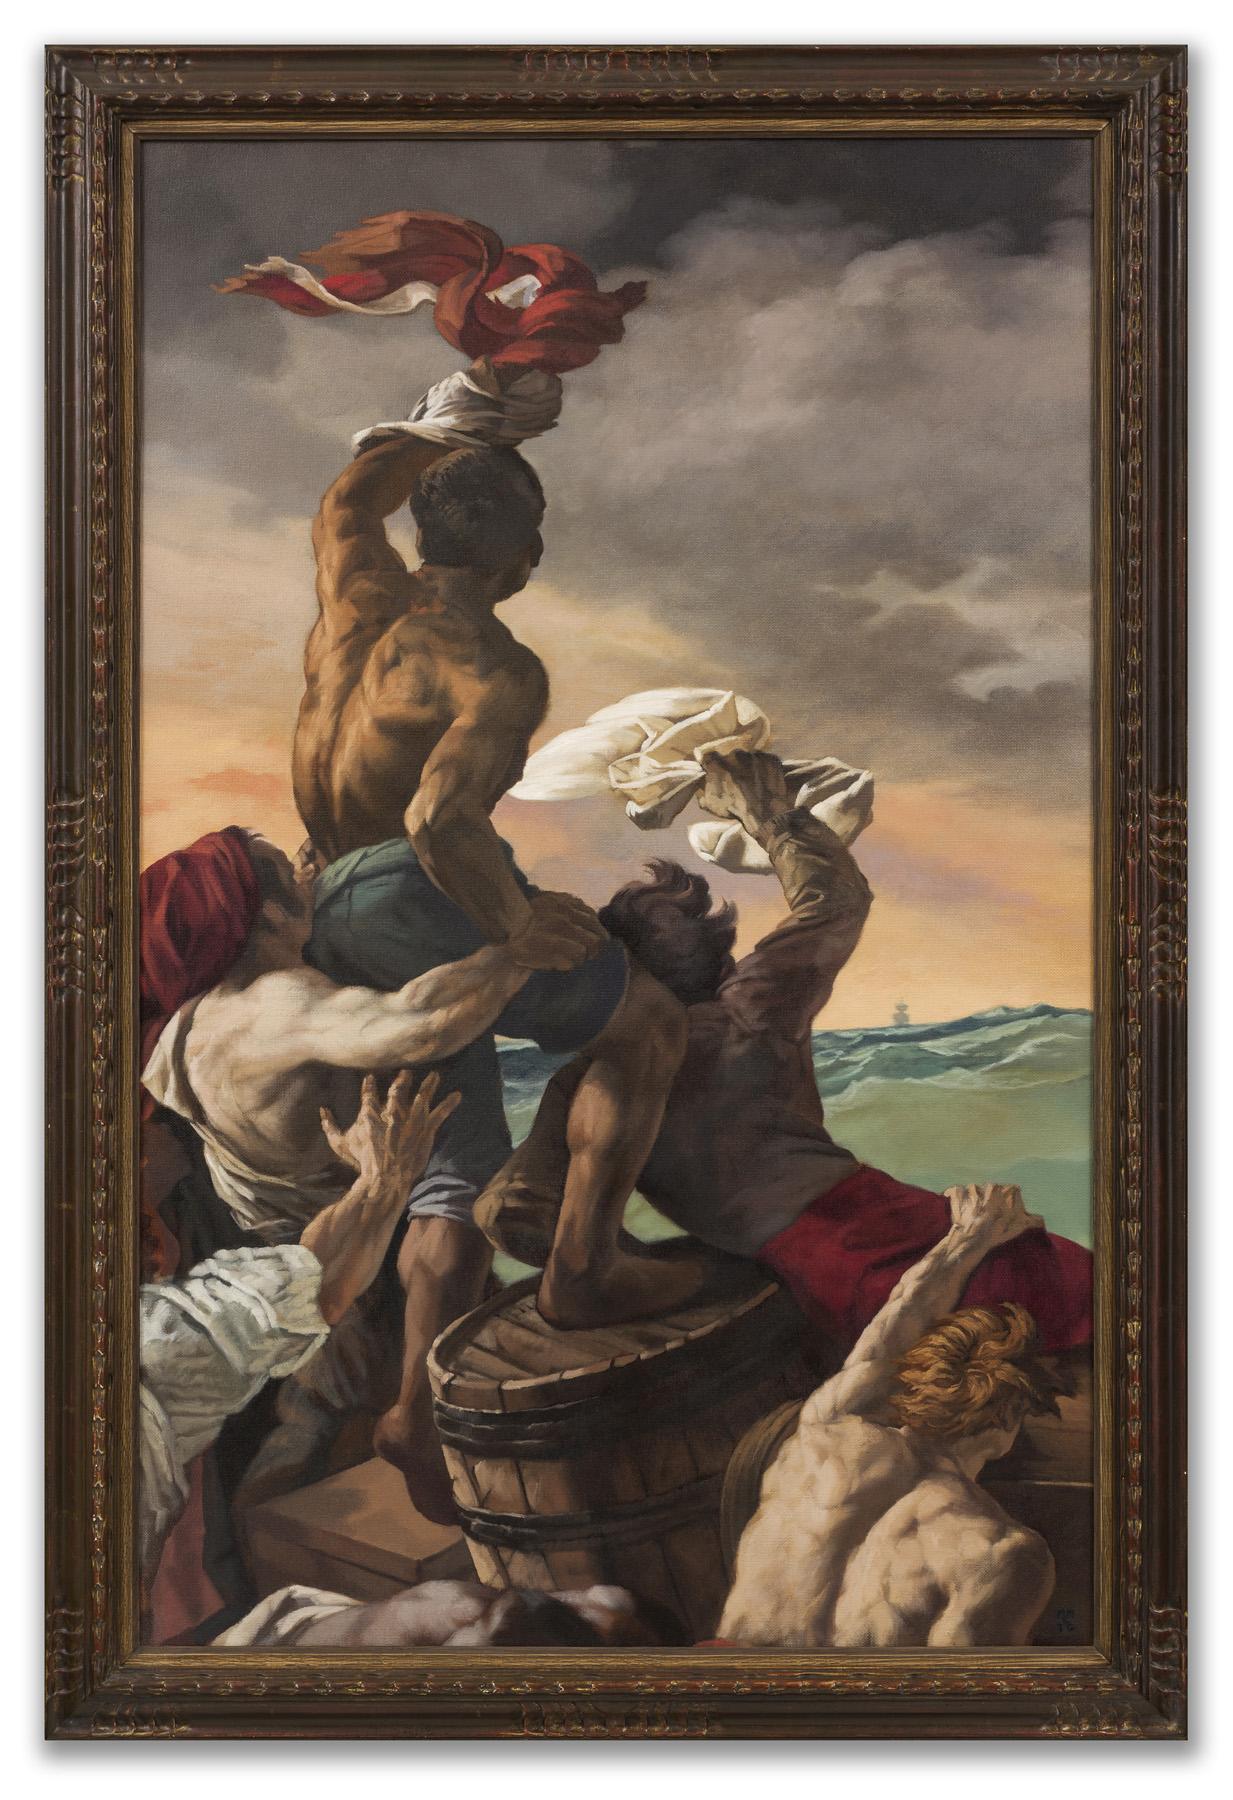 Michael Murfin, (British b.1954), Exploring Géricault, 2011.